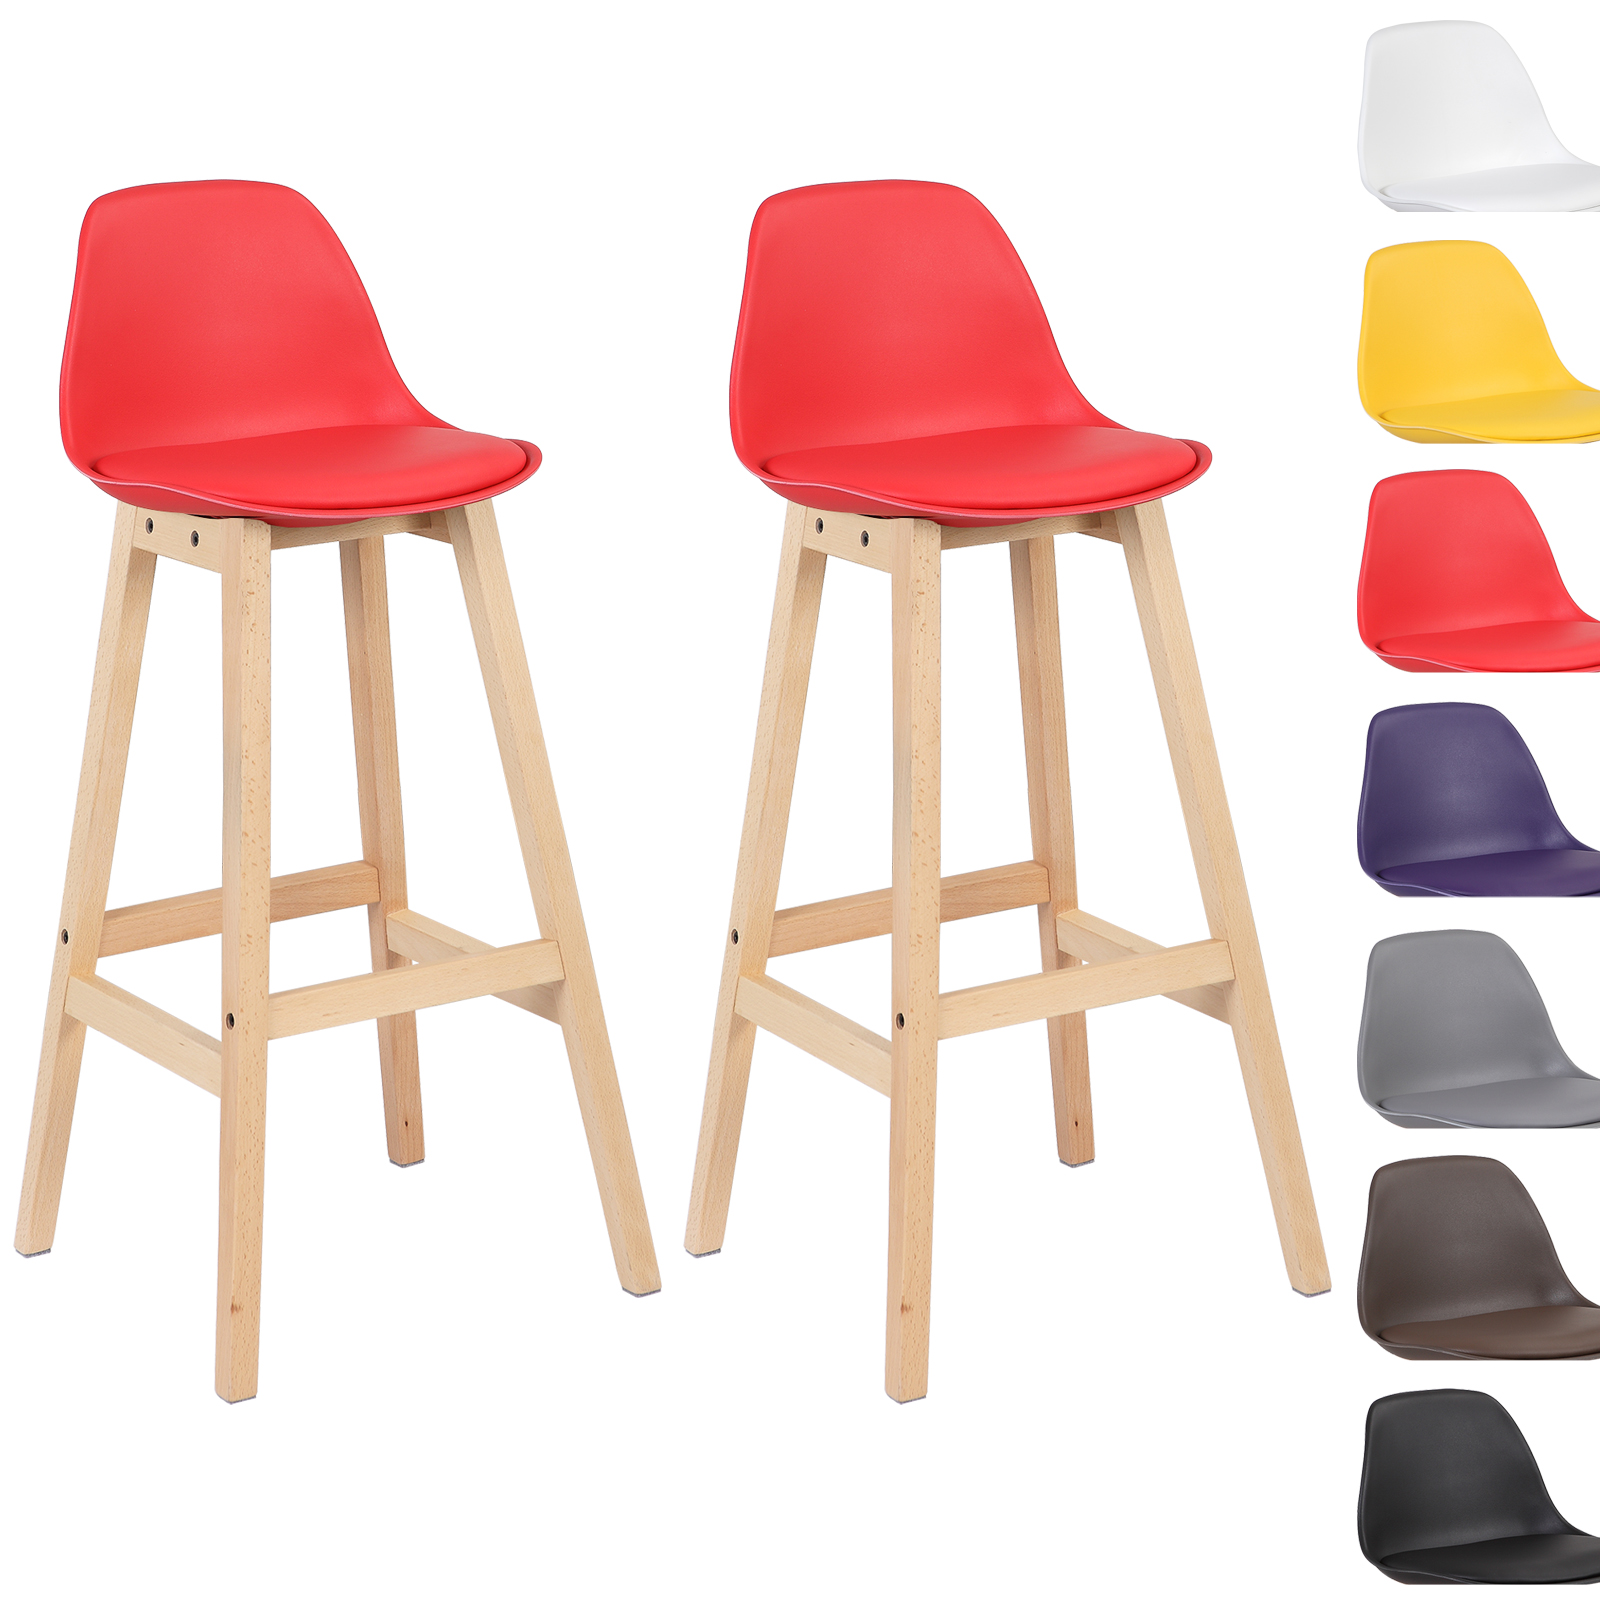 lot de 2 tabouret de bar en plastique tabouret de cuisine en bois f086 ebay. Black Bedroom Furniture Sets. Home Design Ideas